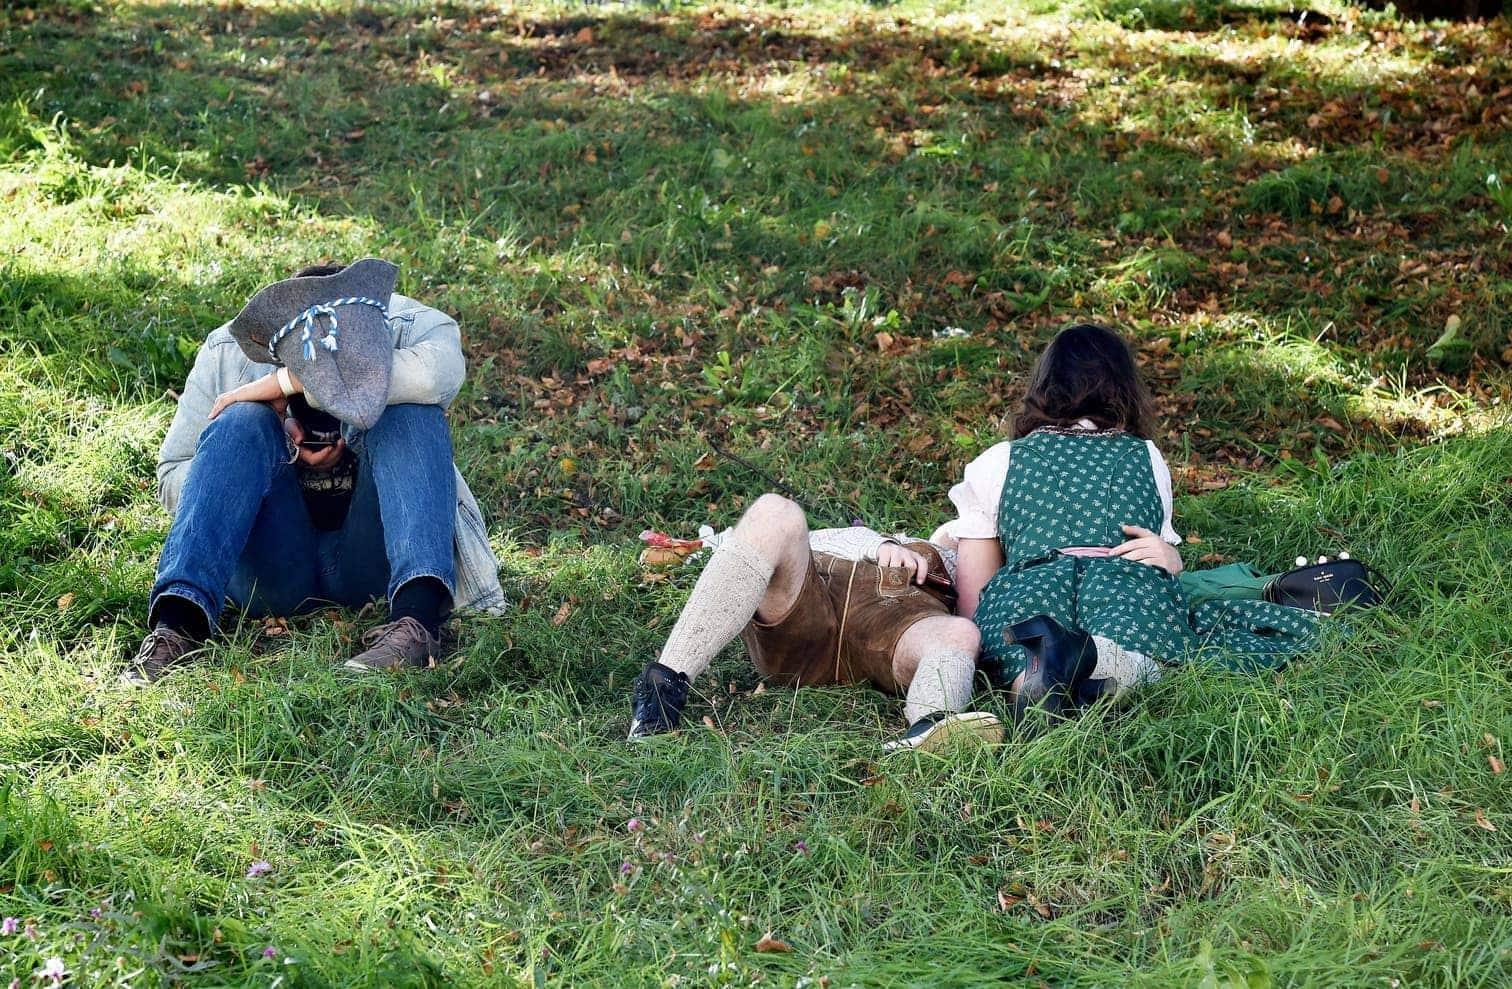 <p>Keine untypische Szene: Alkoholprobleme am Hang.</p> Foto: dpa